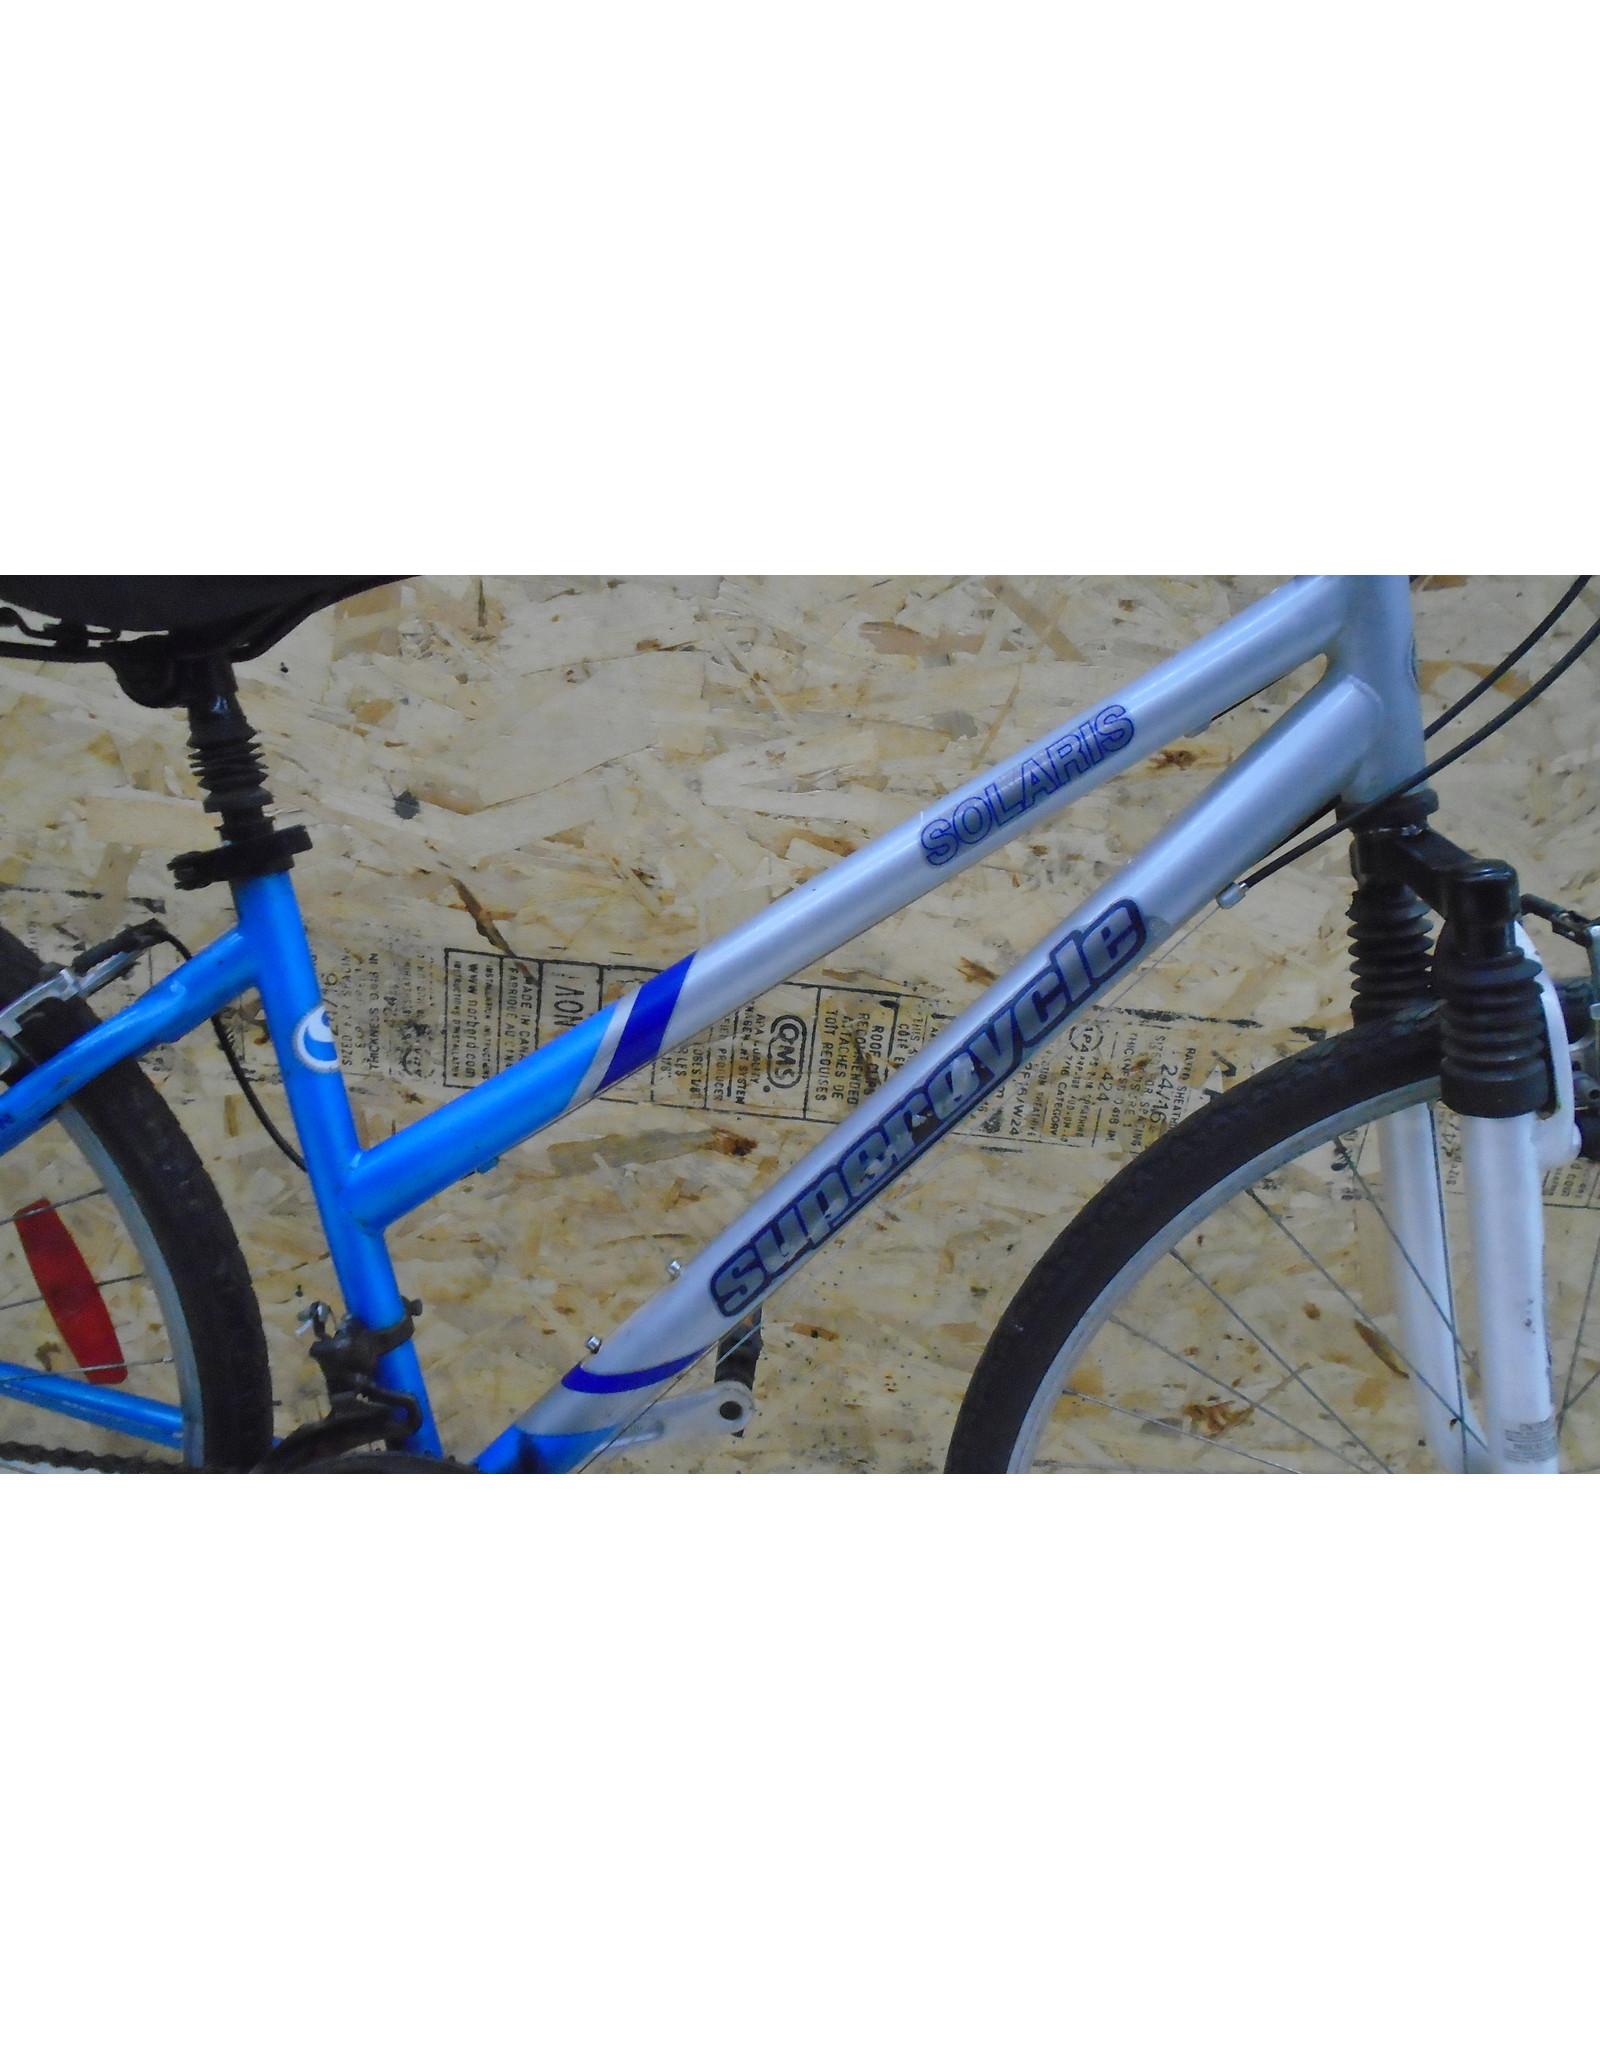 "Vélo usagé hybride Supercycle 16"" - 10916"